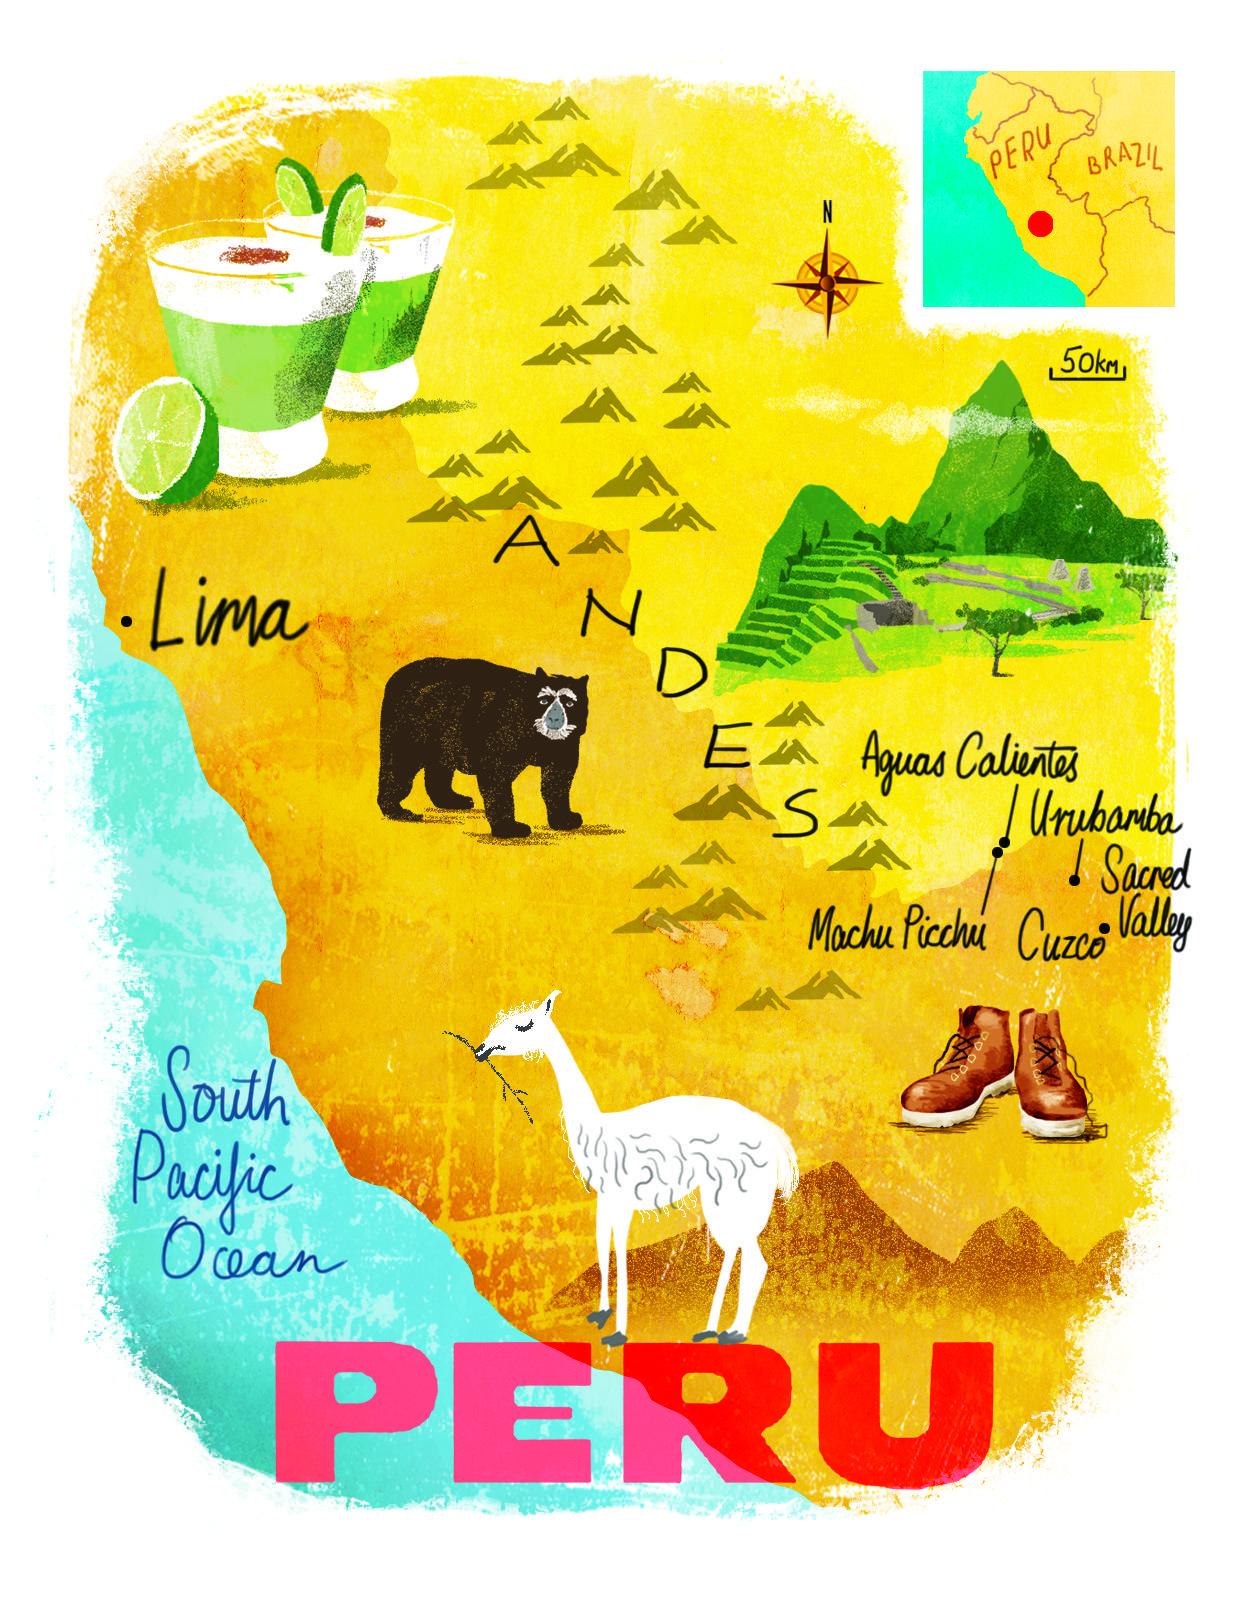 Peru Map By Scott Jessop Map Peru Education Pinterest - Perus map